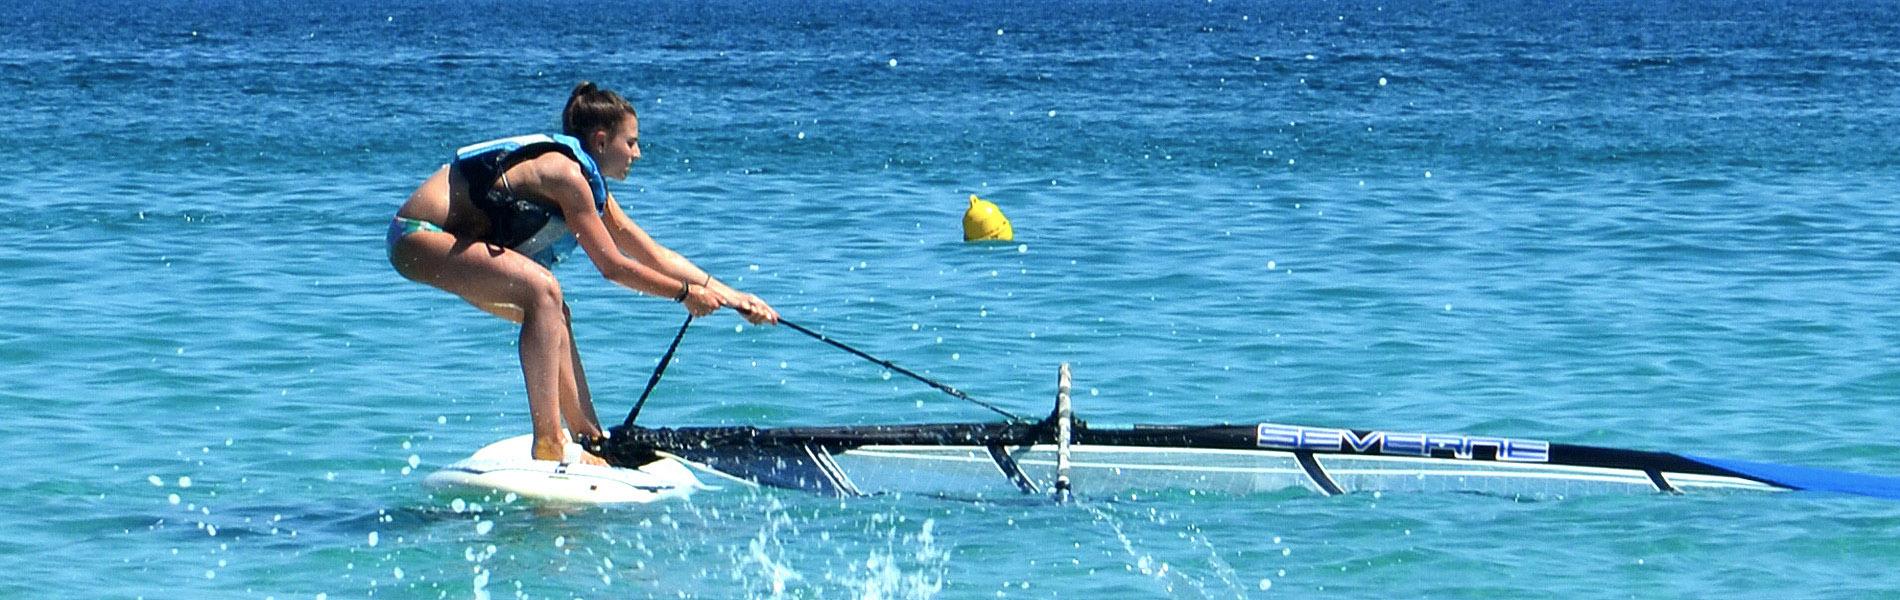 Nauticlub corso windsurf 03